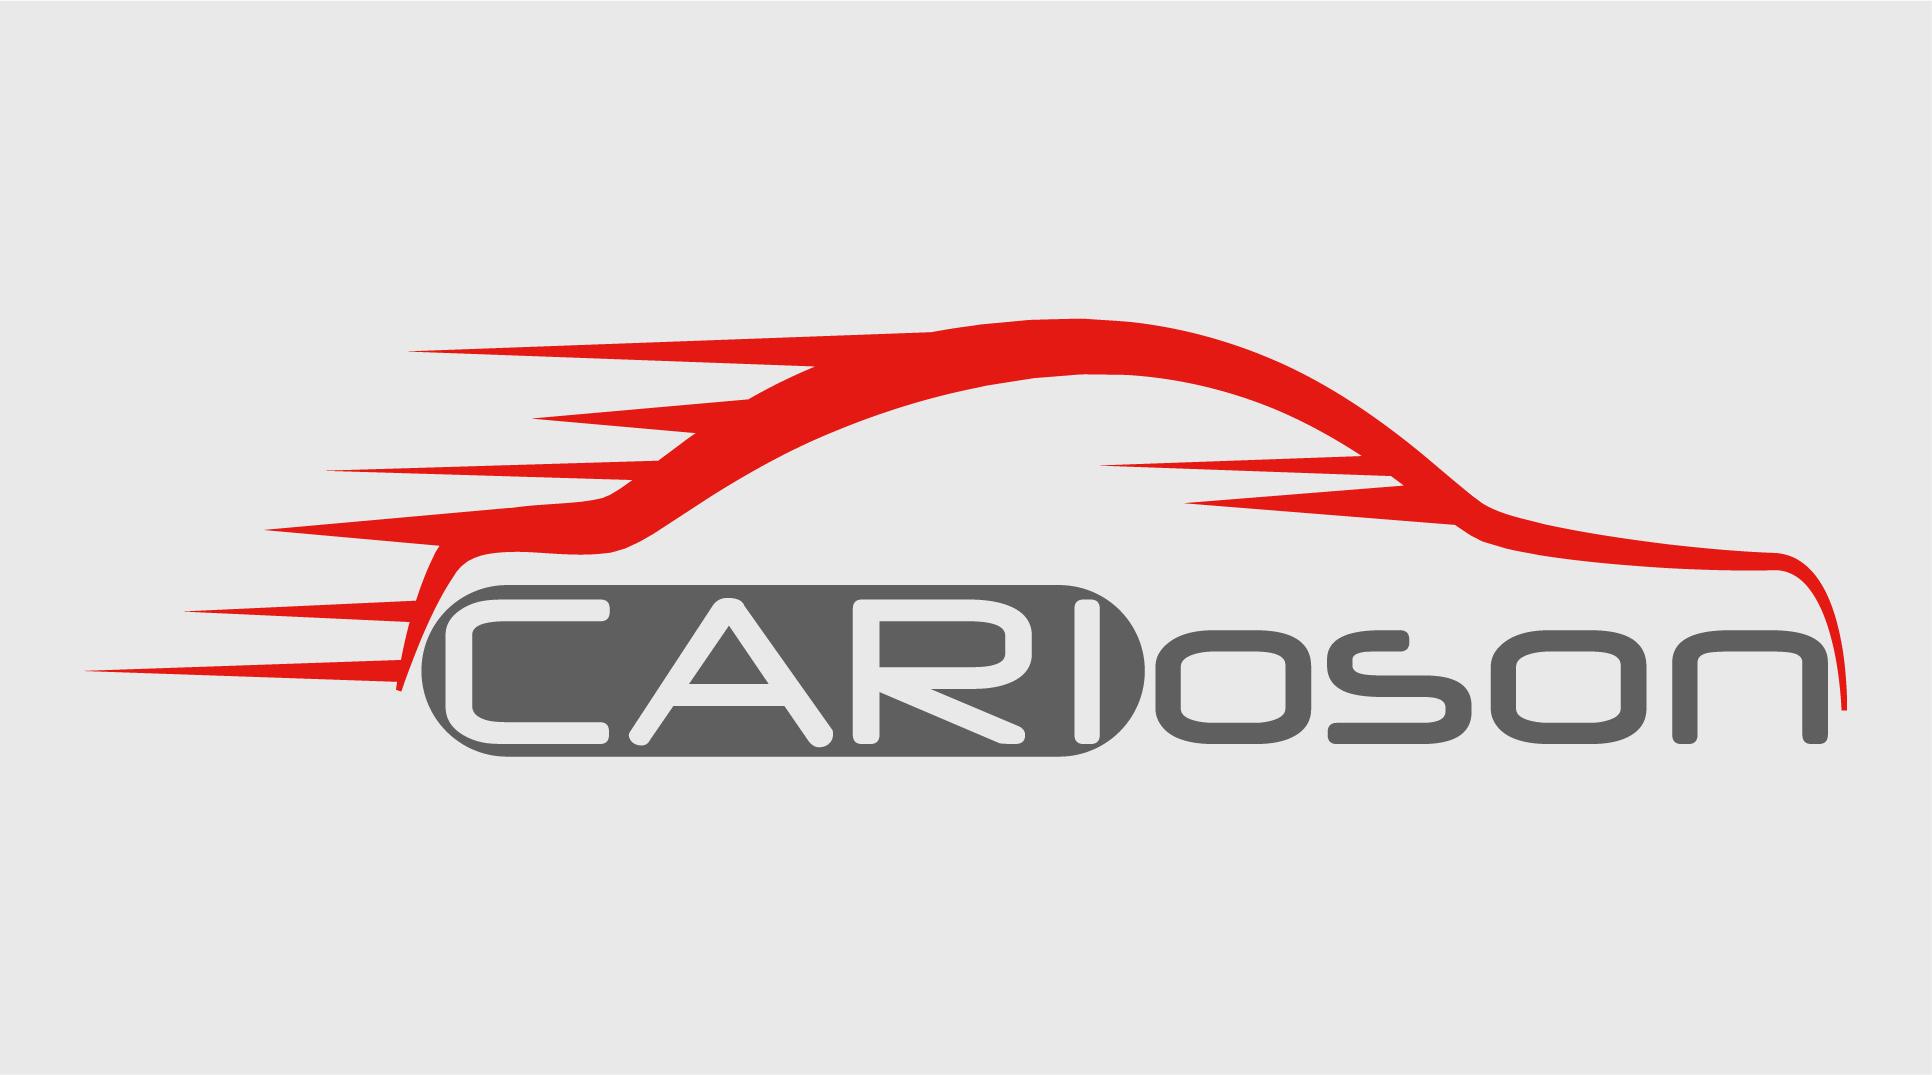 Логотип для компании по прокату  VIP автомобилей фото f_9335adc22b39e0da.jpg